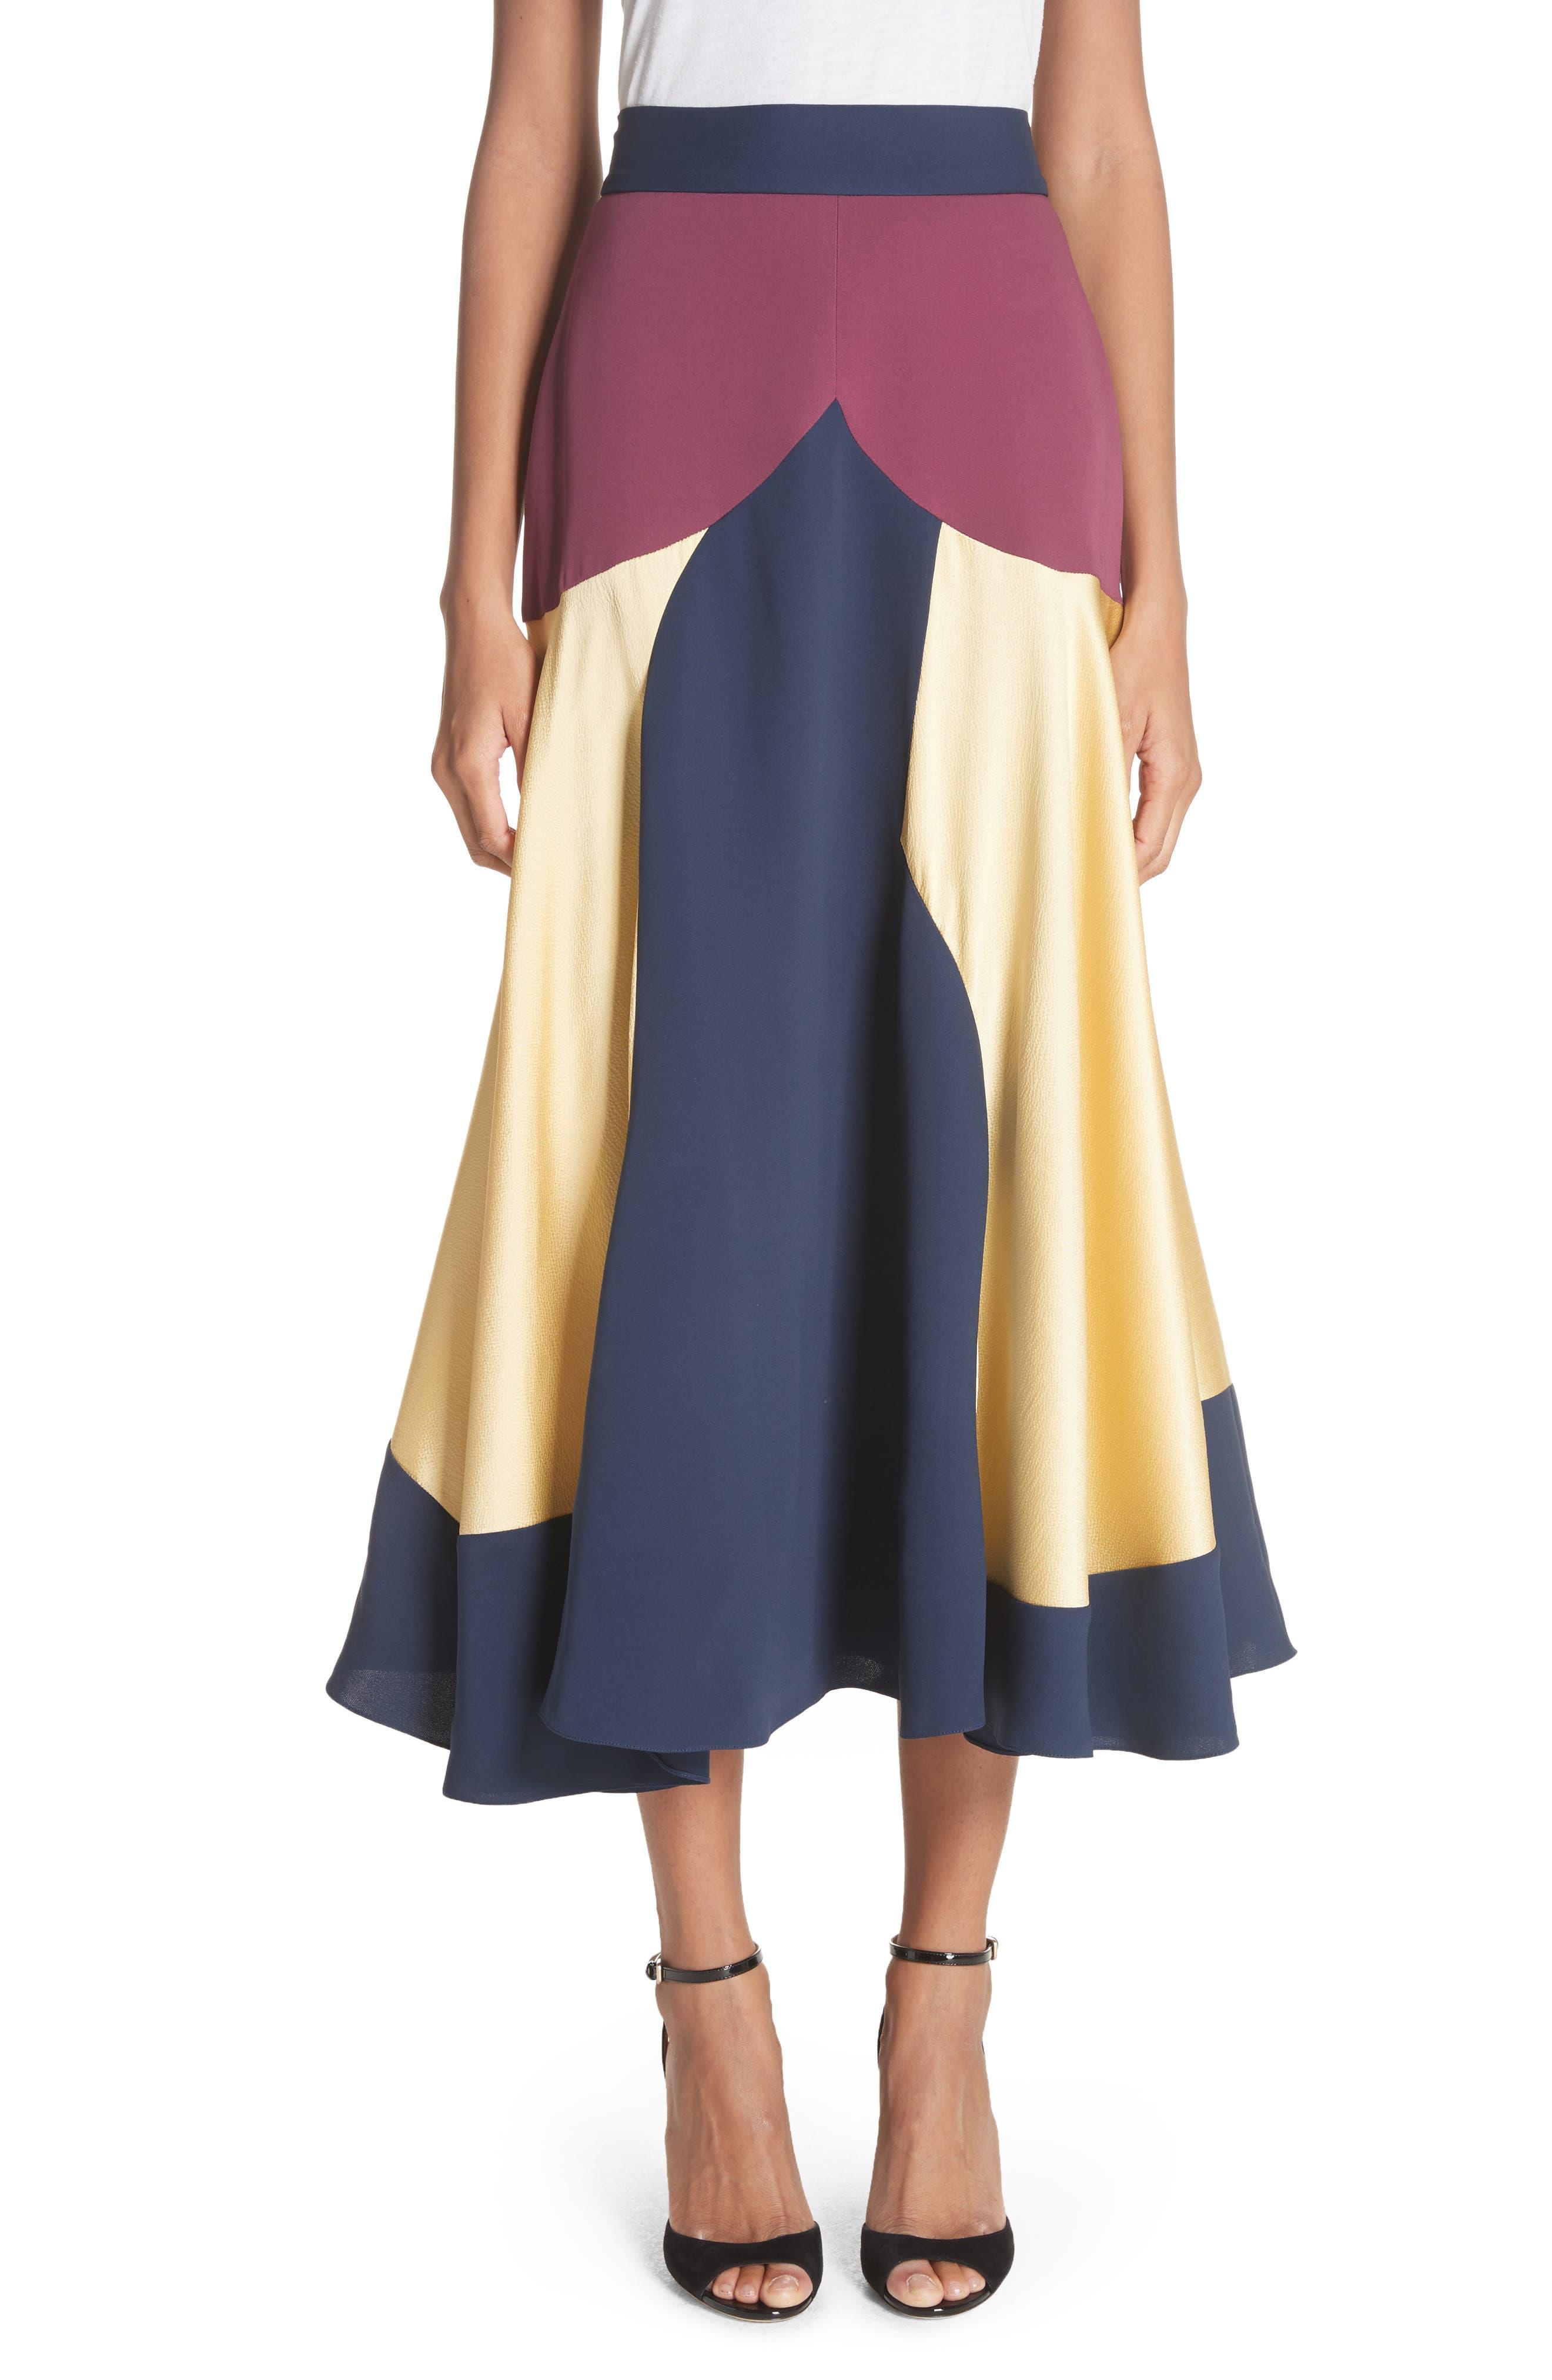 Rania Skirt,                         Main,                         color, Sorbet/ Plum/ Navy